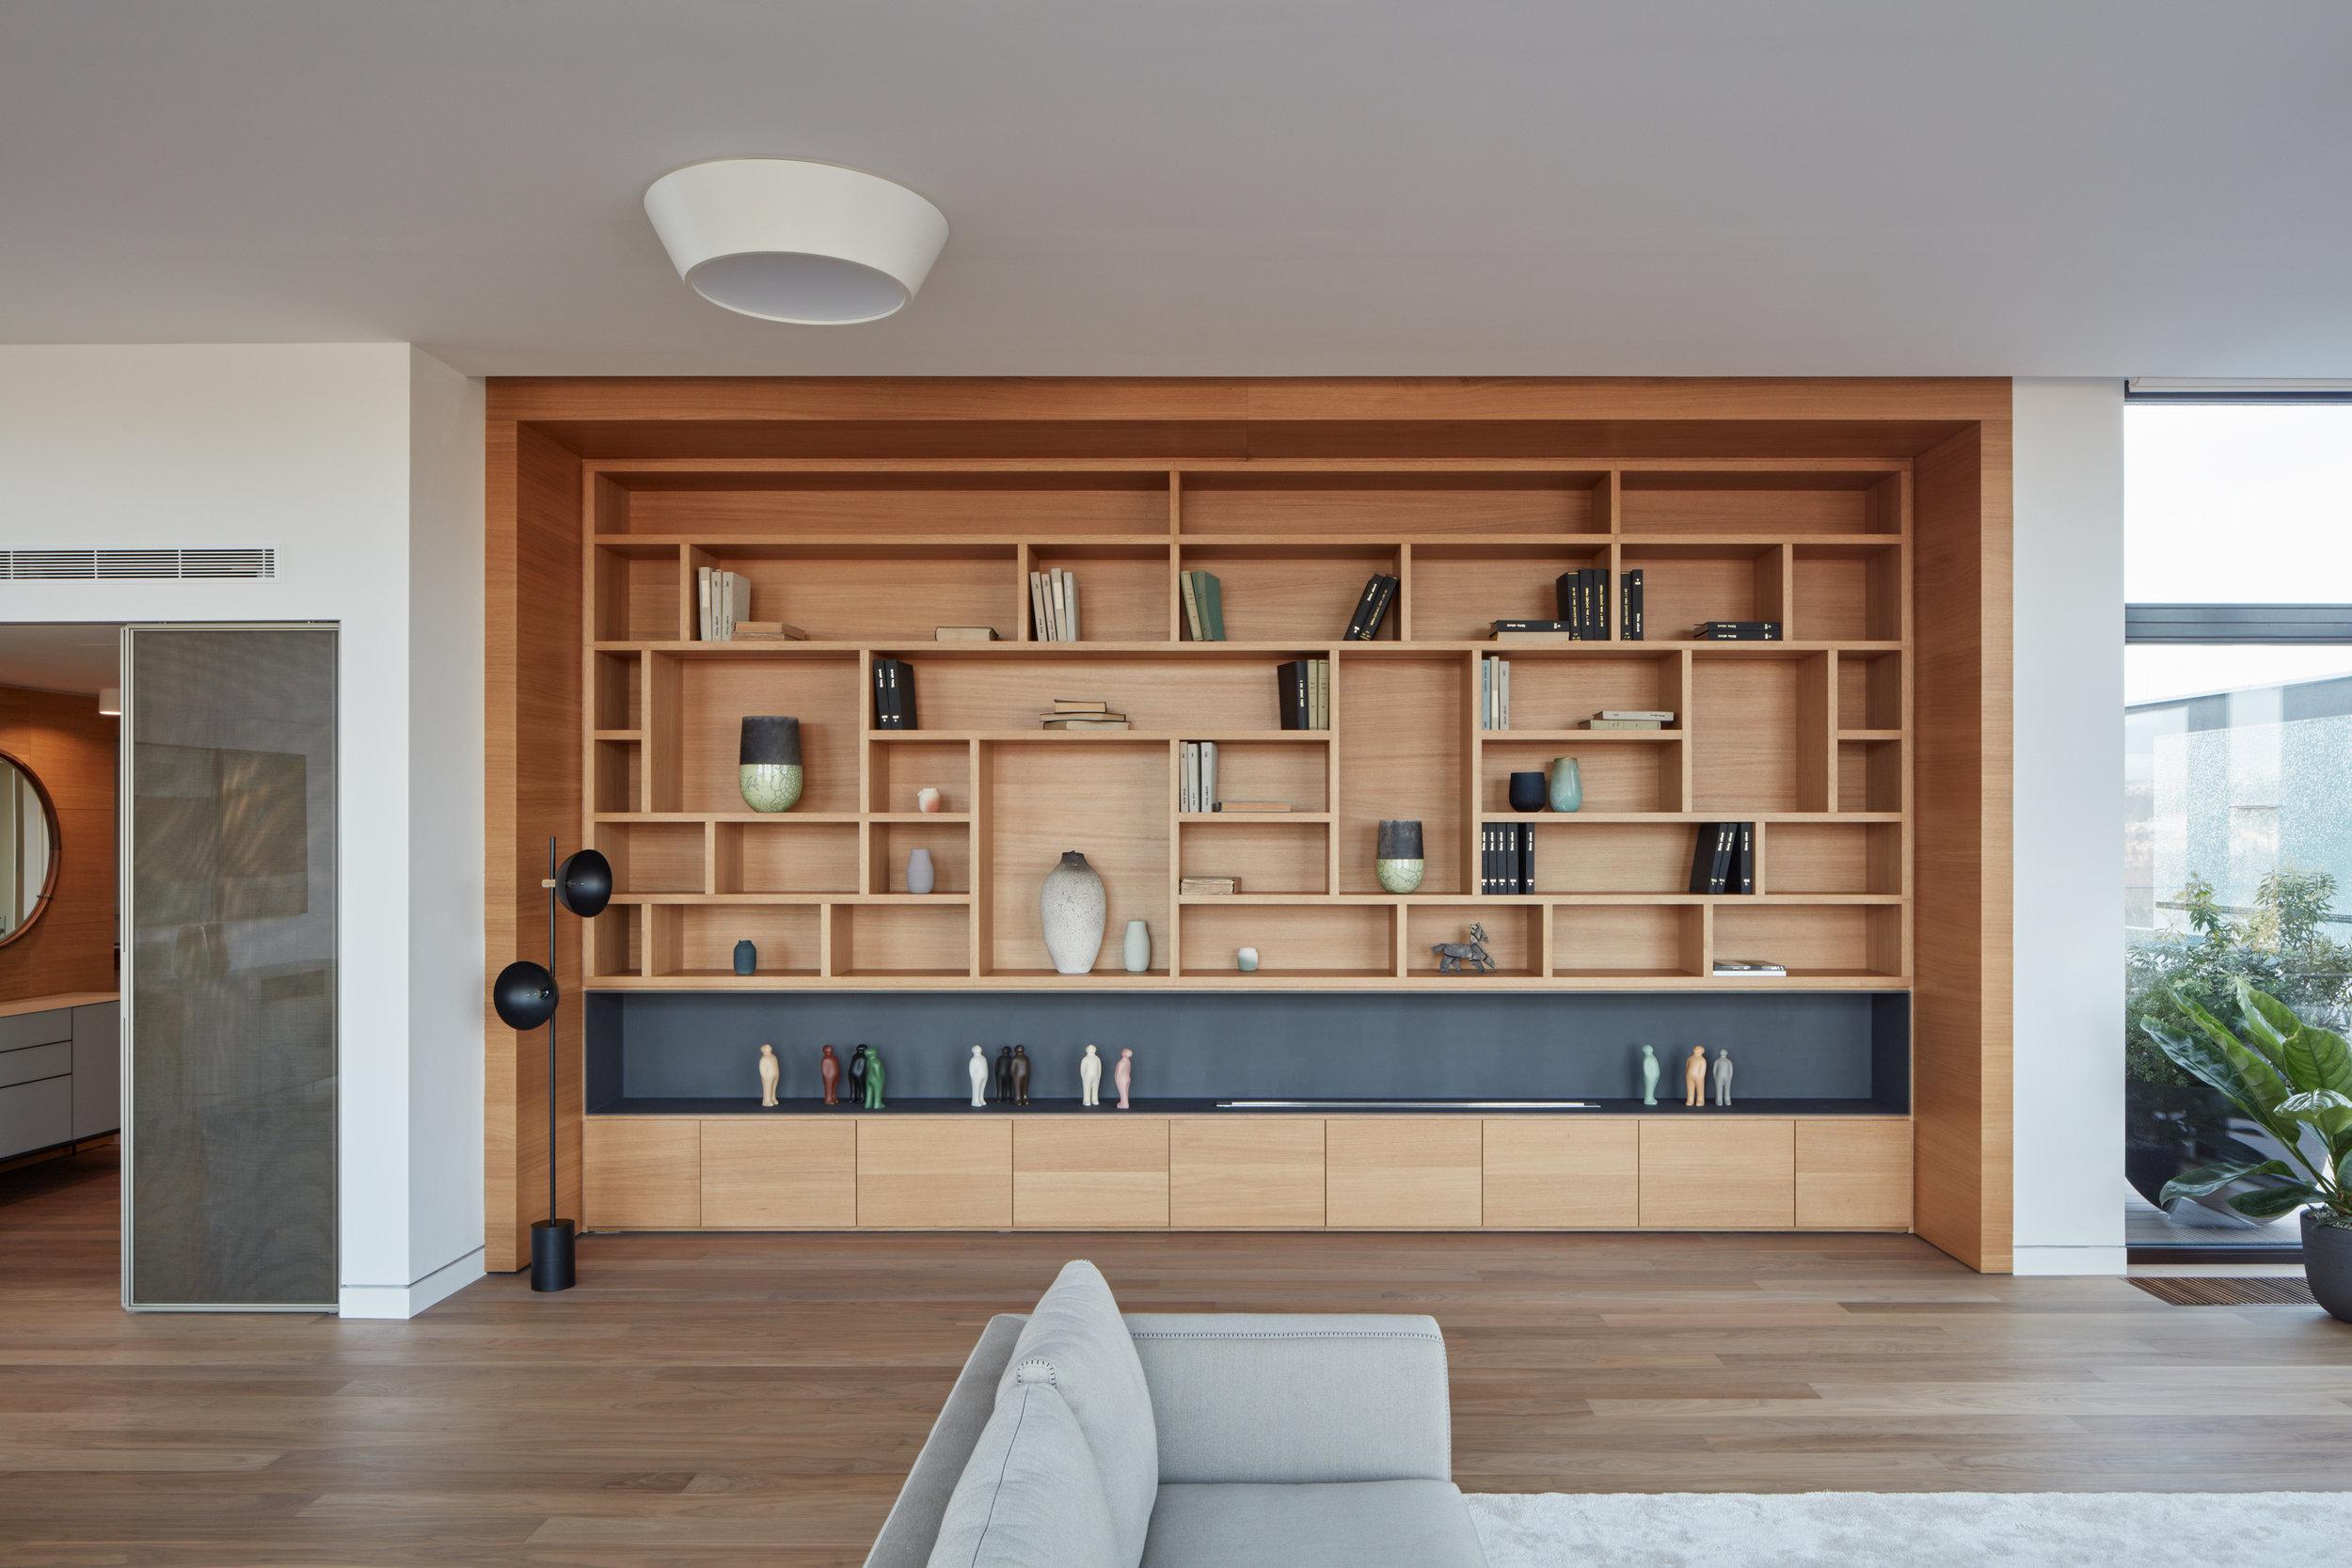 Go_Architects_Marina_Island_BoysPlayNice_13.jpg